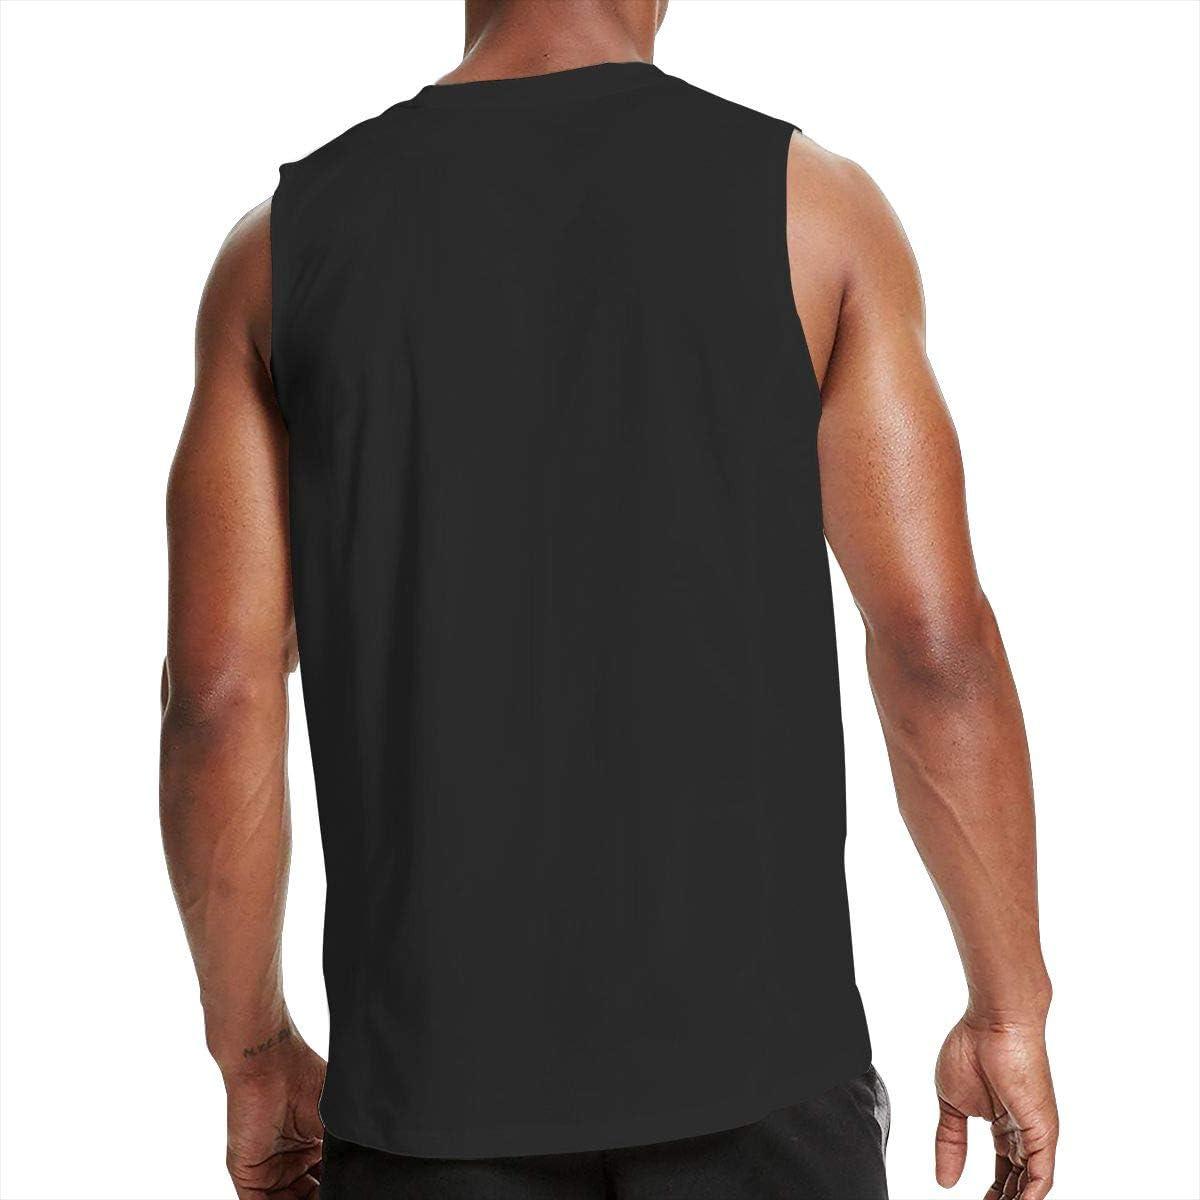 Nanakang Mike Tyson Boxing Mens Round Neck Summer Sport Tank Tops Sleeveless Shirt Casual Black